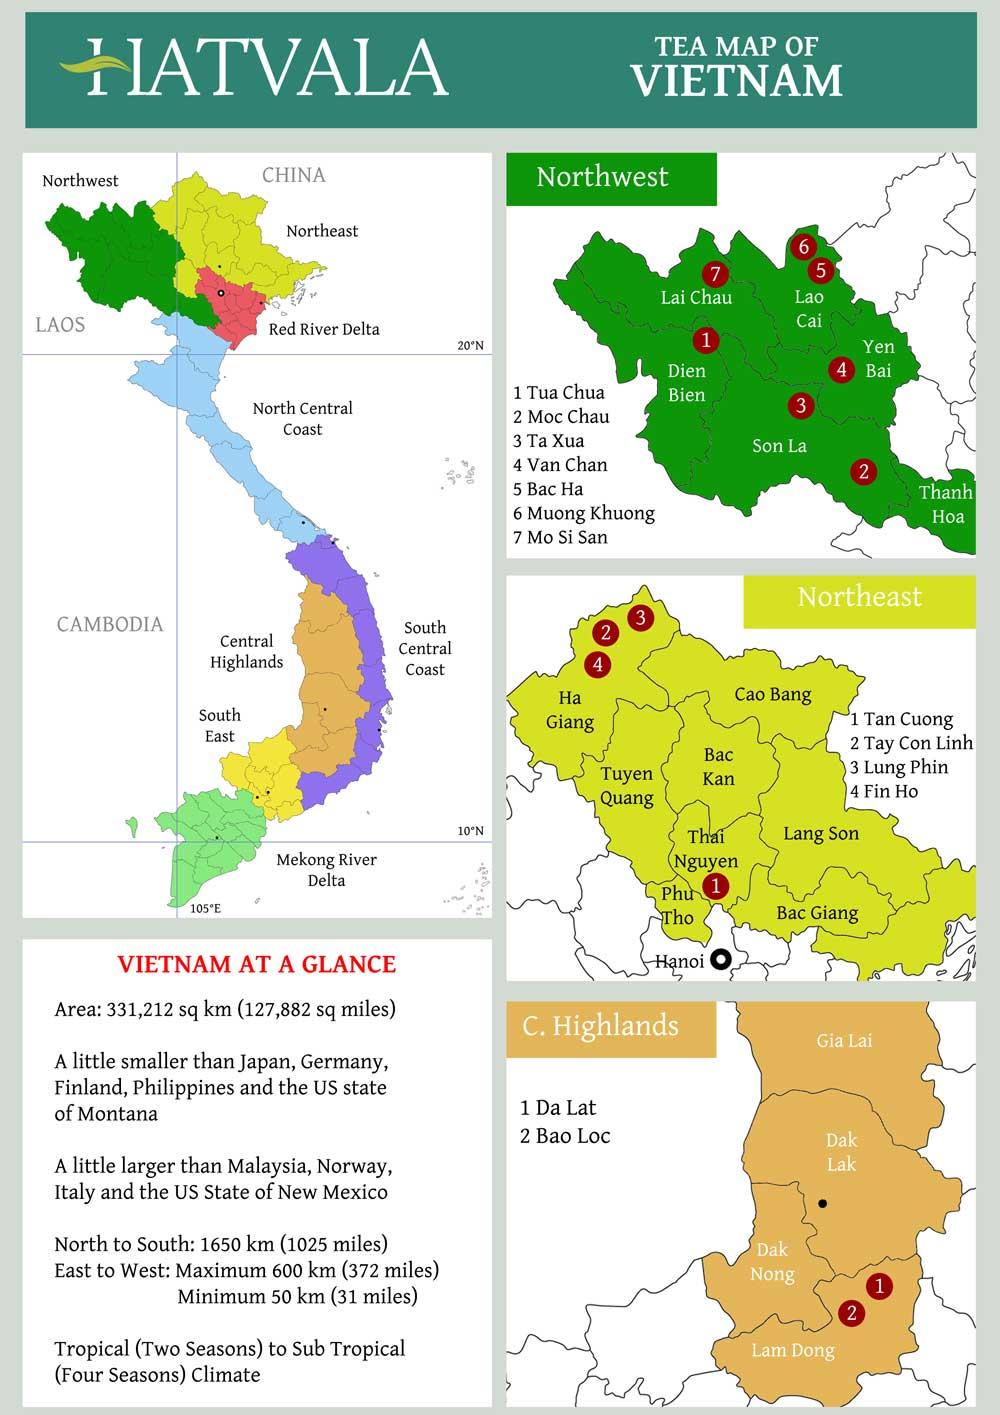 Vietnam Tea Map